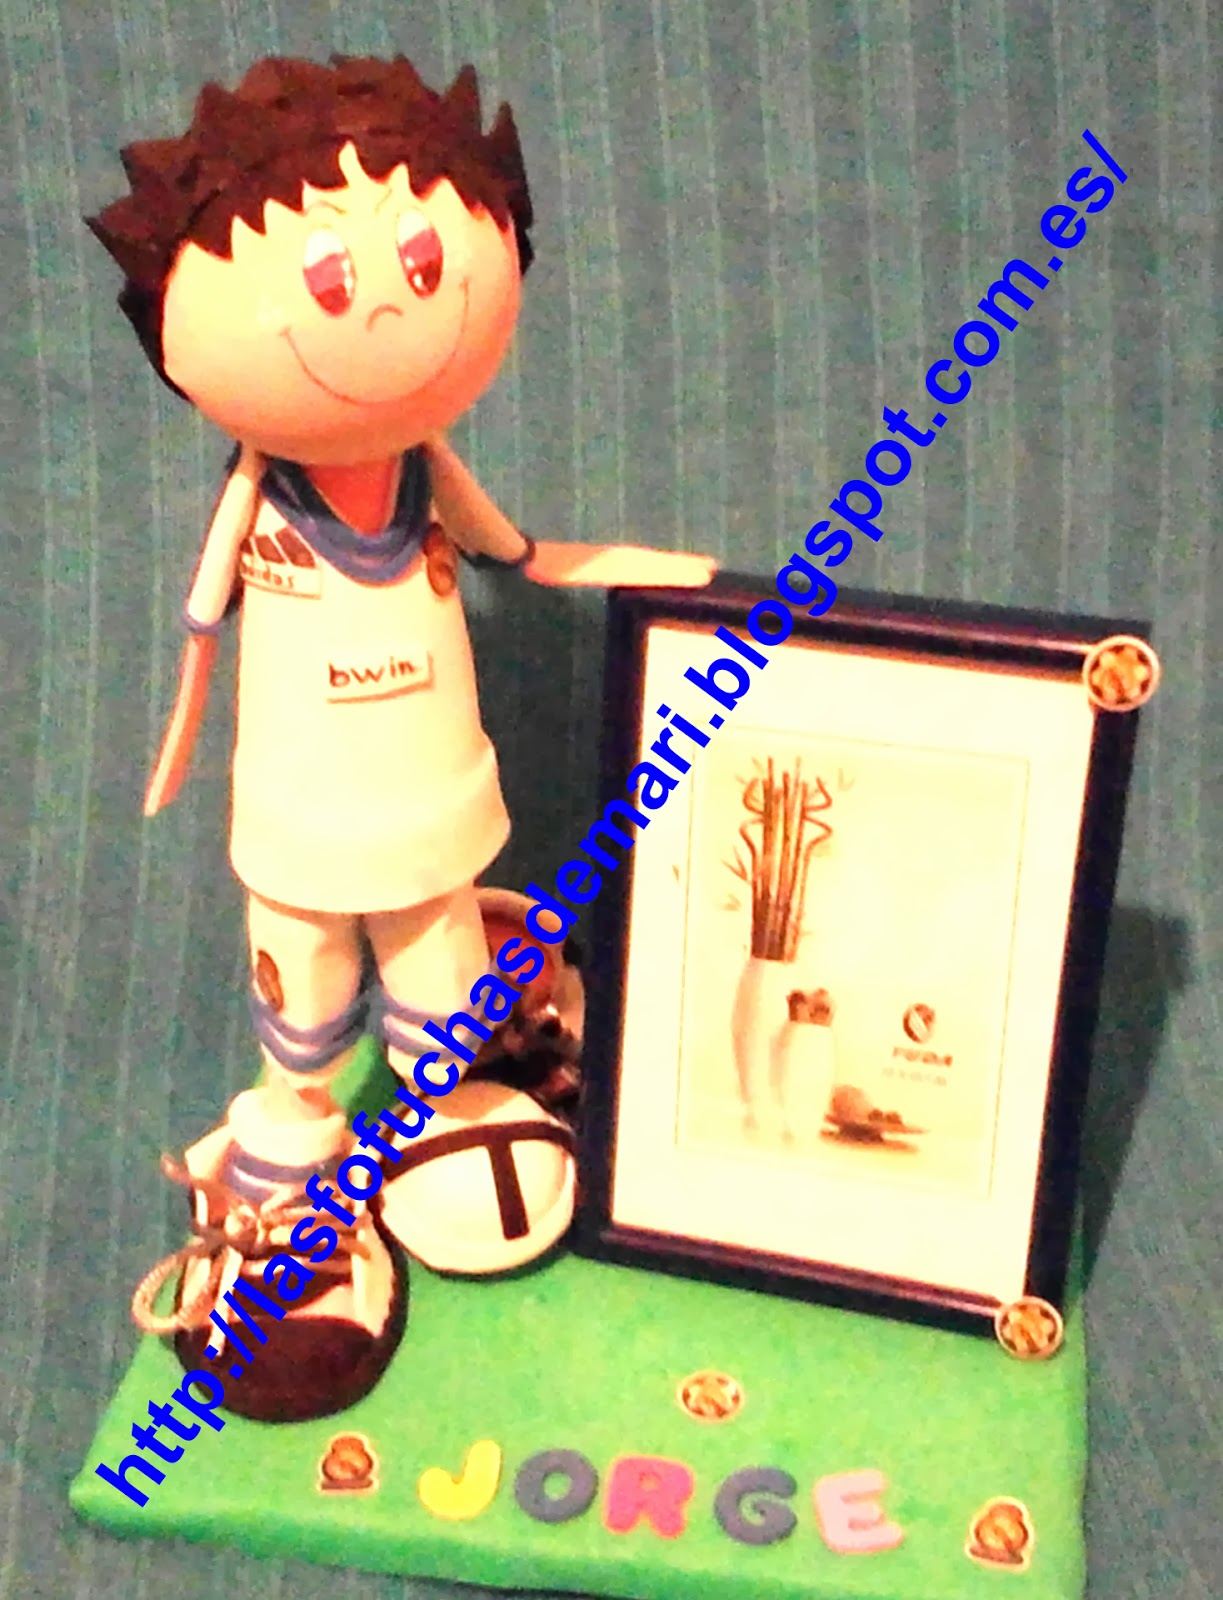 Jugador Real Madrid personalizado: Jorge